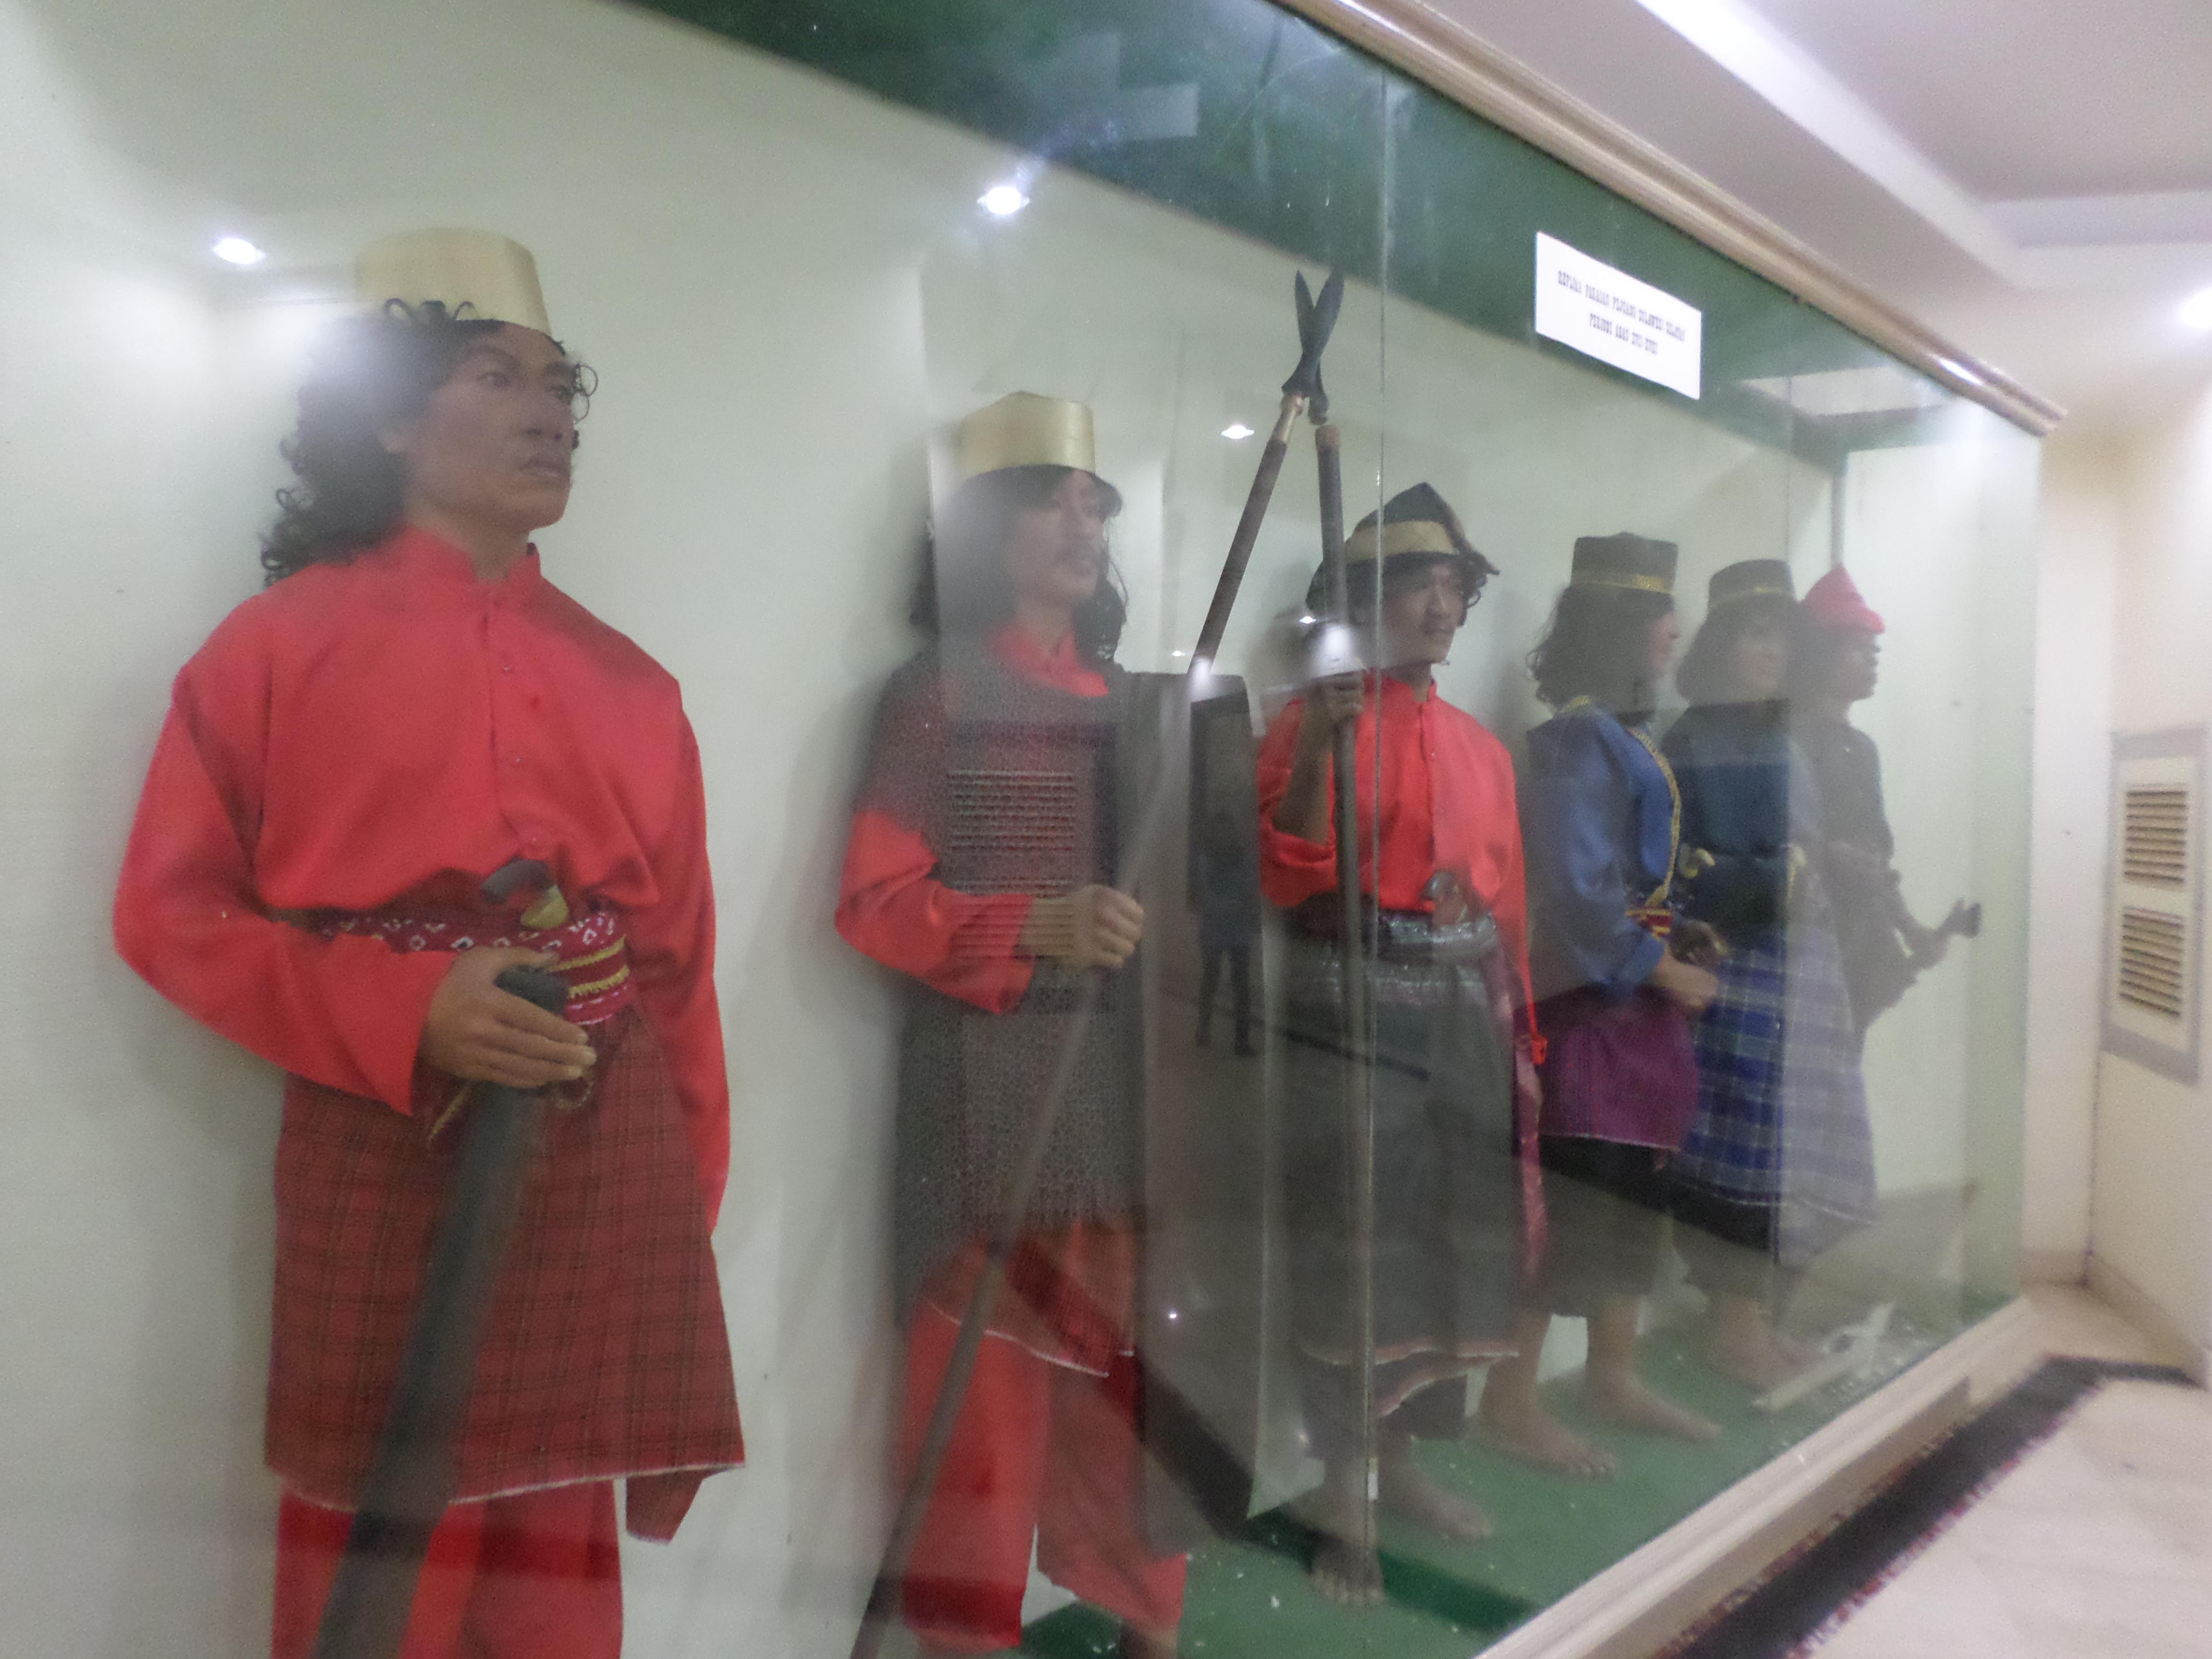 Monumen Mandala Monas Makassar Akbar Mangindara Baju Tradisional Sulawesi Selatan